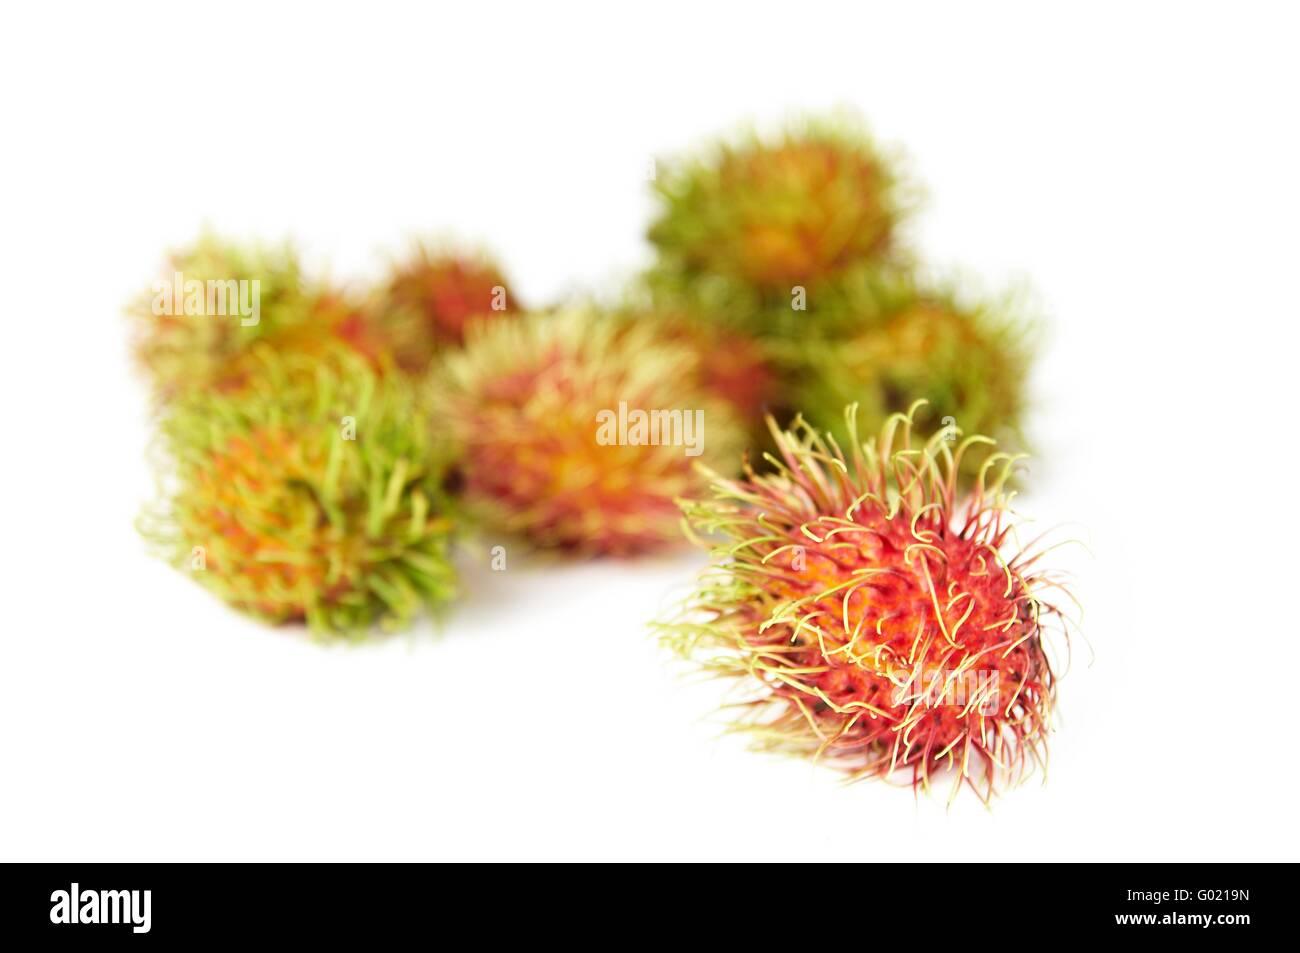 rambutan hairy fruit sweet thai fruit stock photos & rambutan hairy